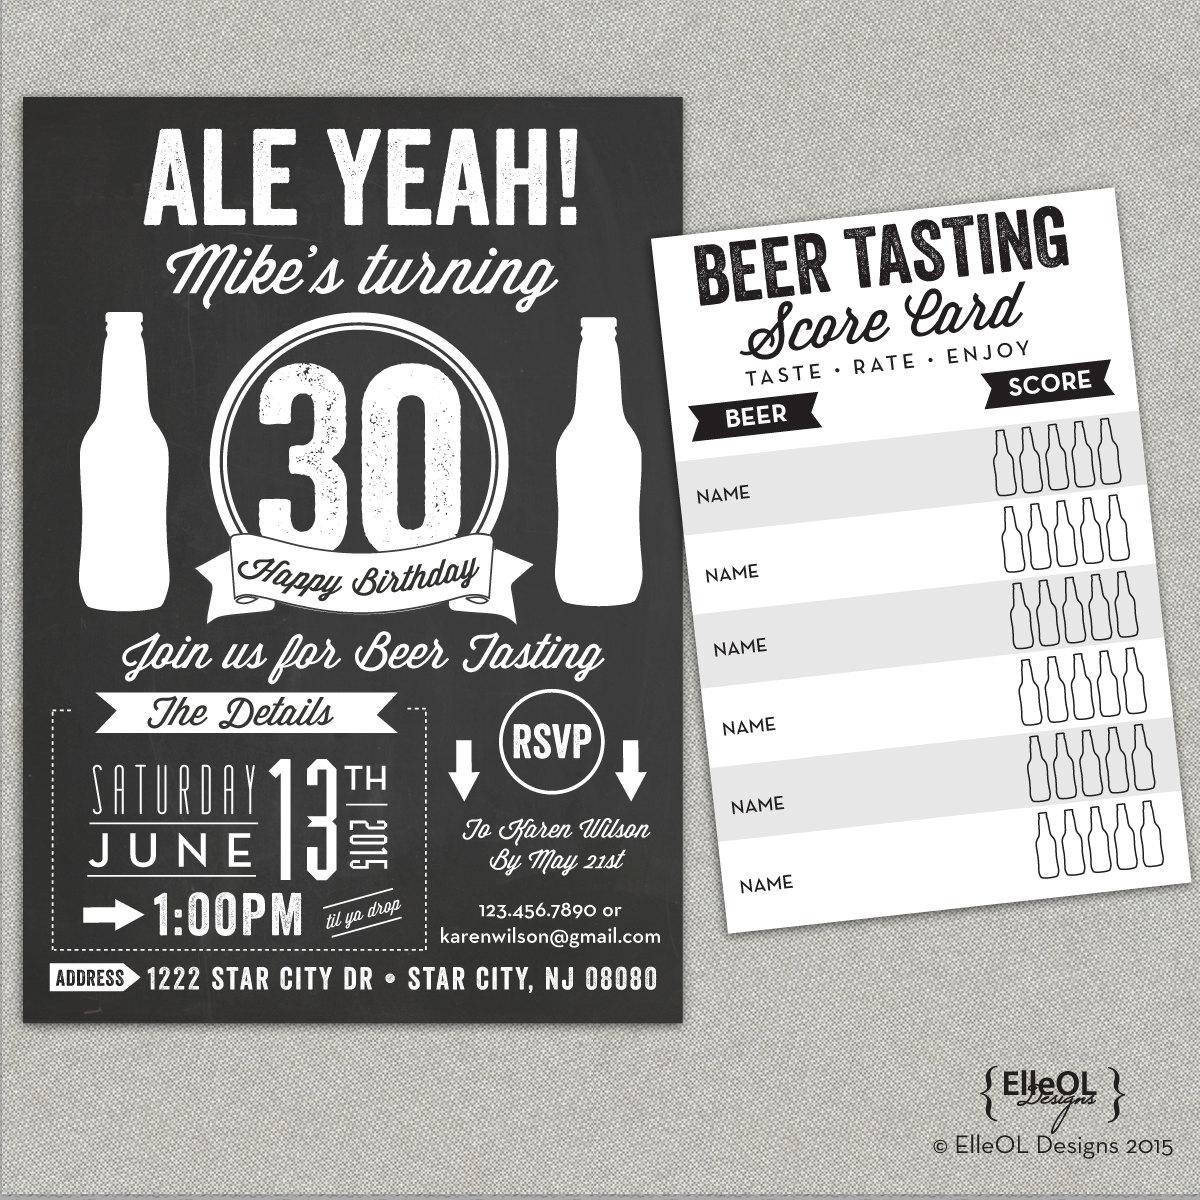 Chalkboard beer tasting birthday party invitation Ale Yeah | Etsy